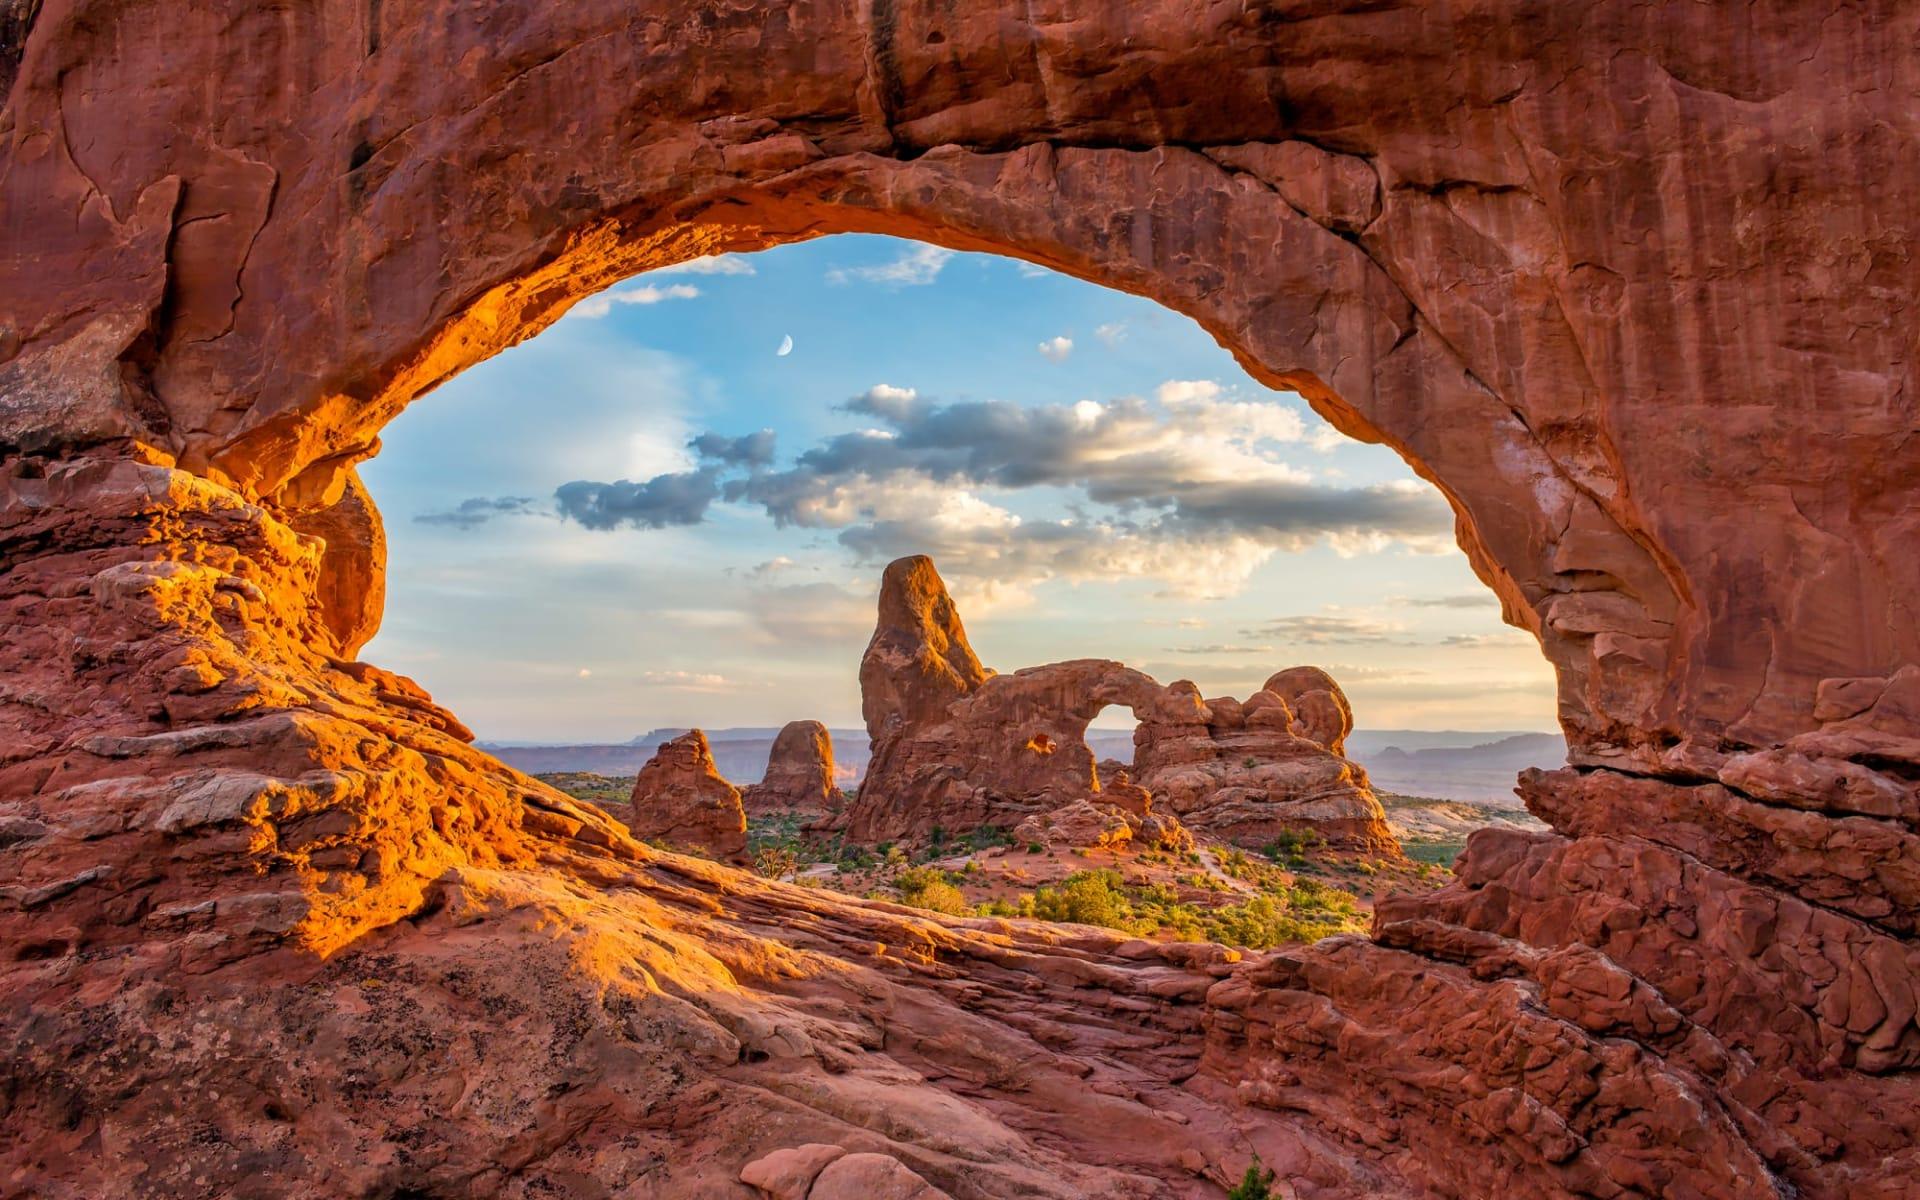 Nationalparks Explorer Extended ab Las Vegas: USA - Utah - Arches Nationalpark North Window